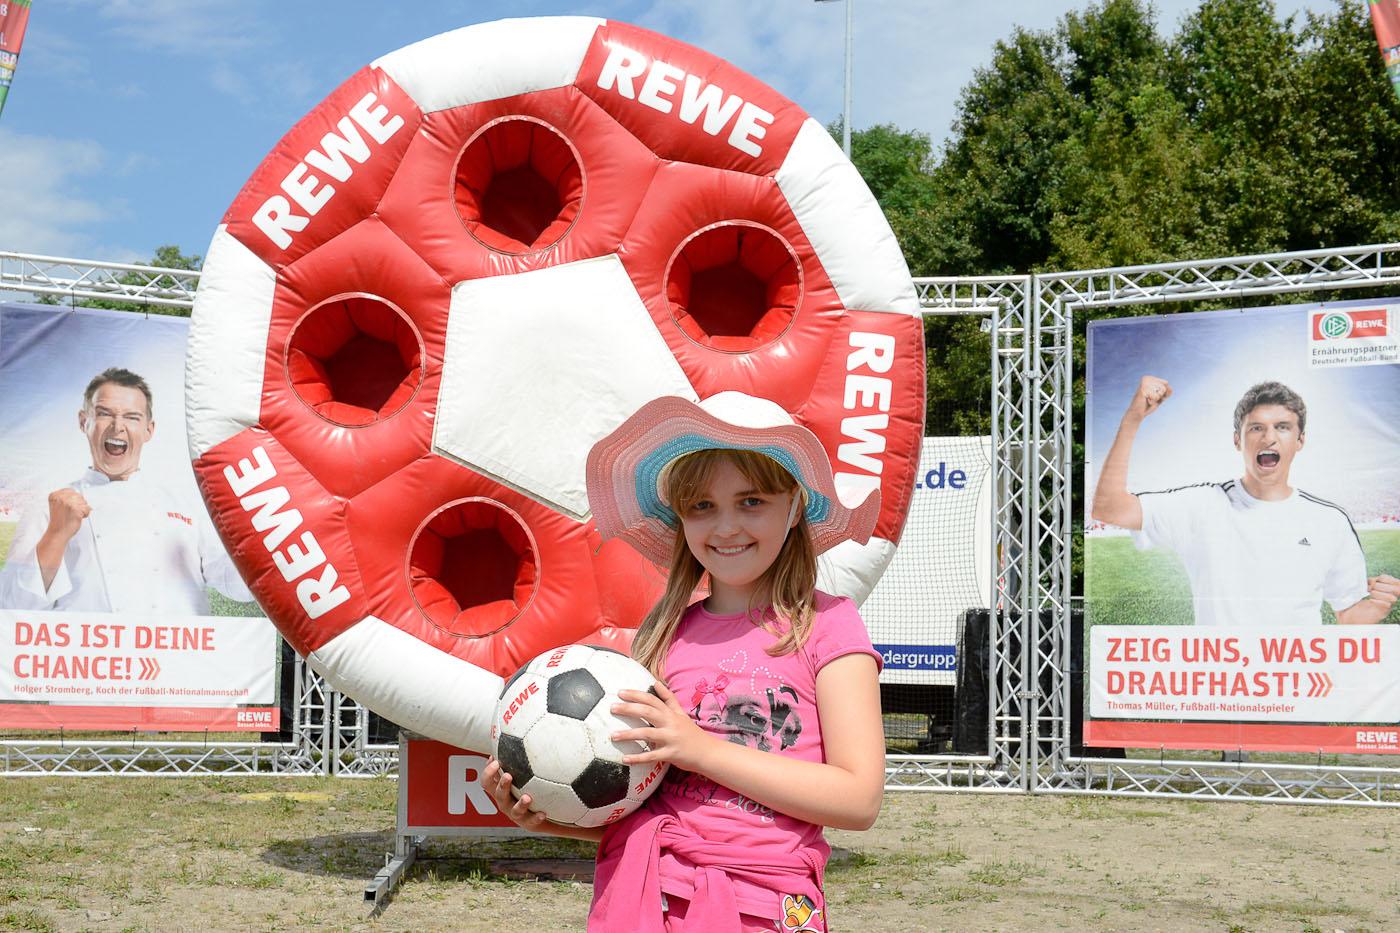 Foto ID 2014080920 Rewe Fussballwelt